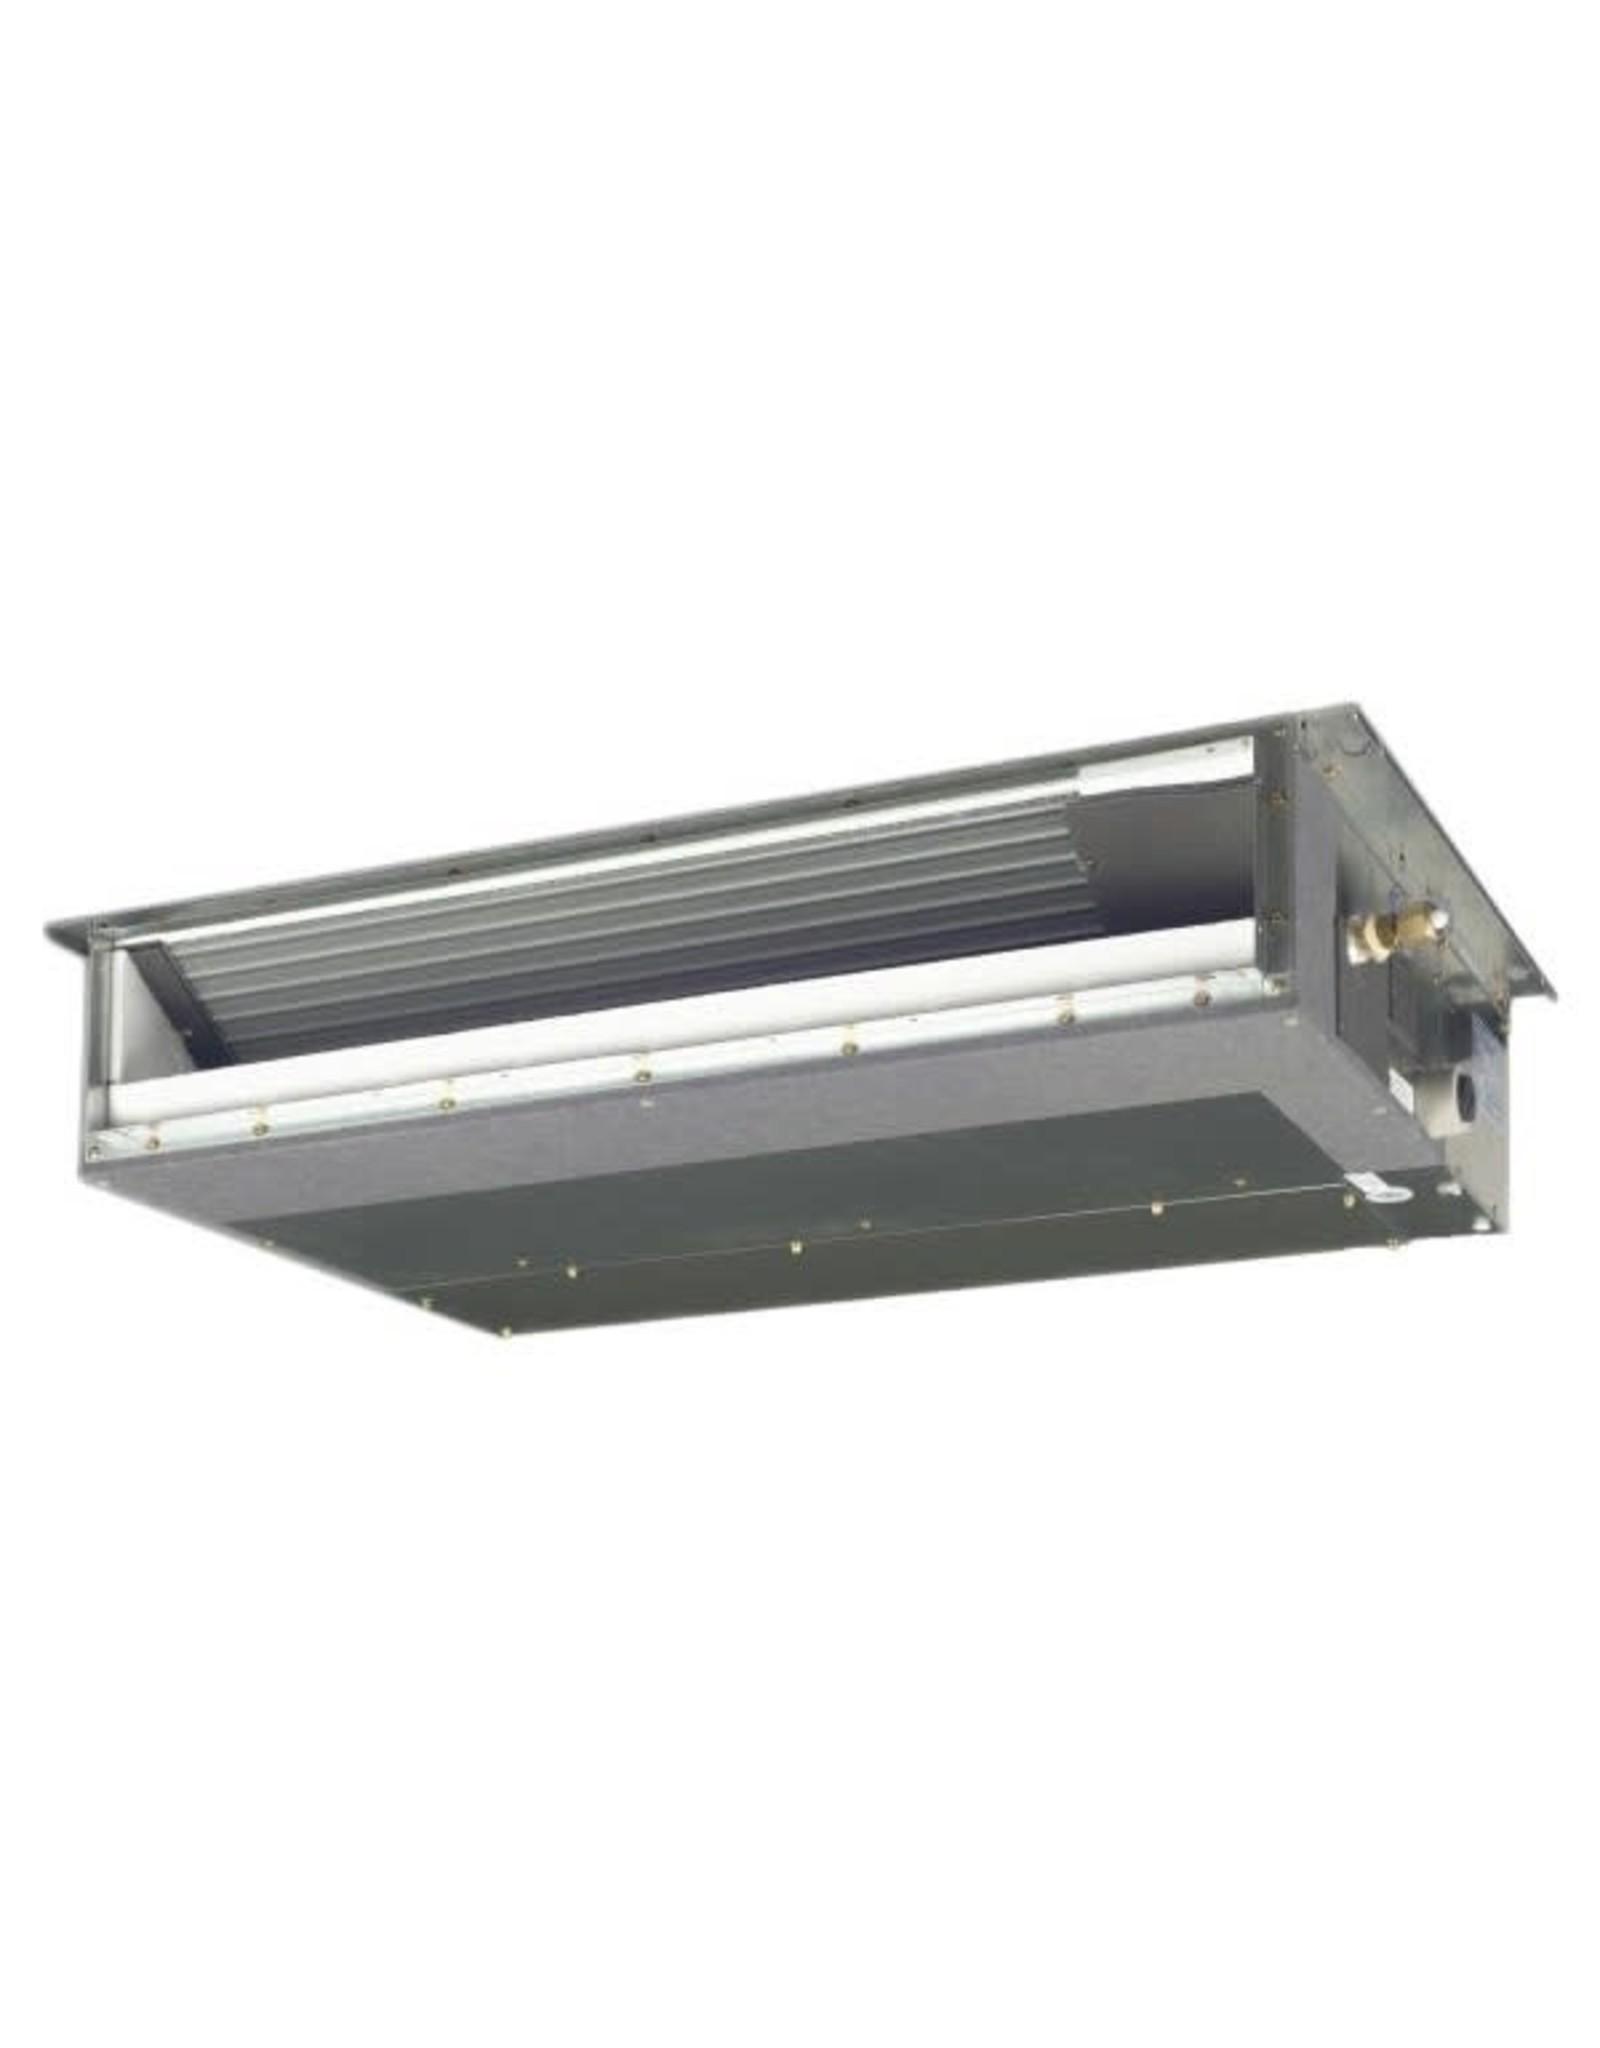 Daikin Applied Americas LV Series Heat-Pump Single Zone Concealed Slim Duct System AHU - 208/230v - 1ph